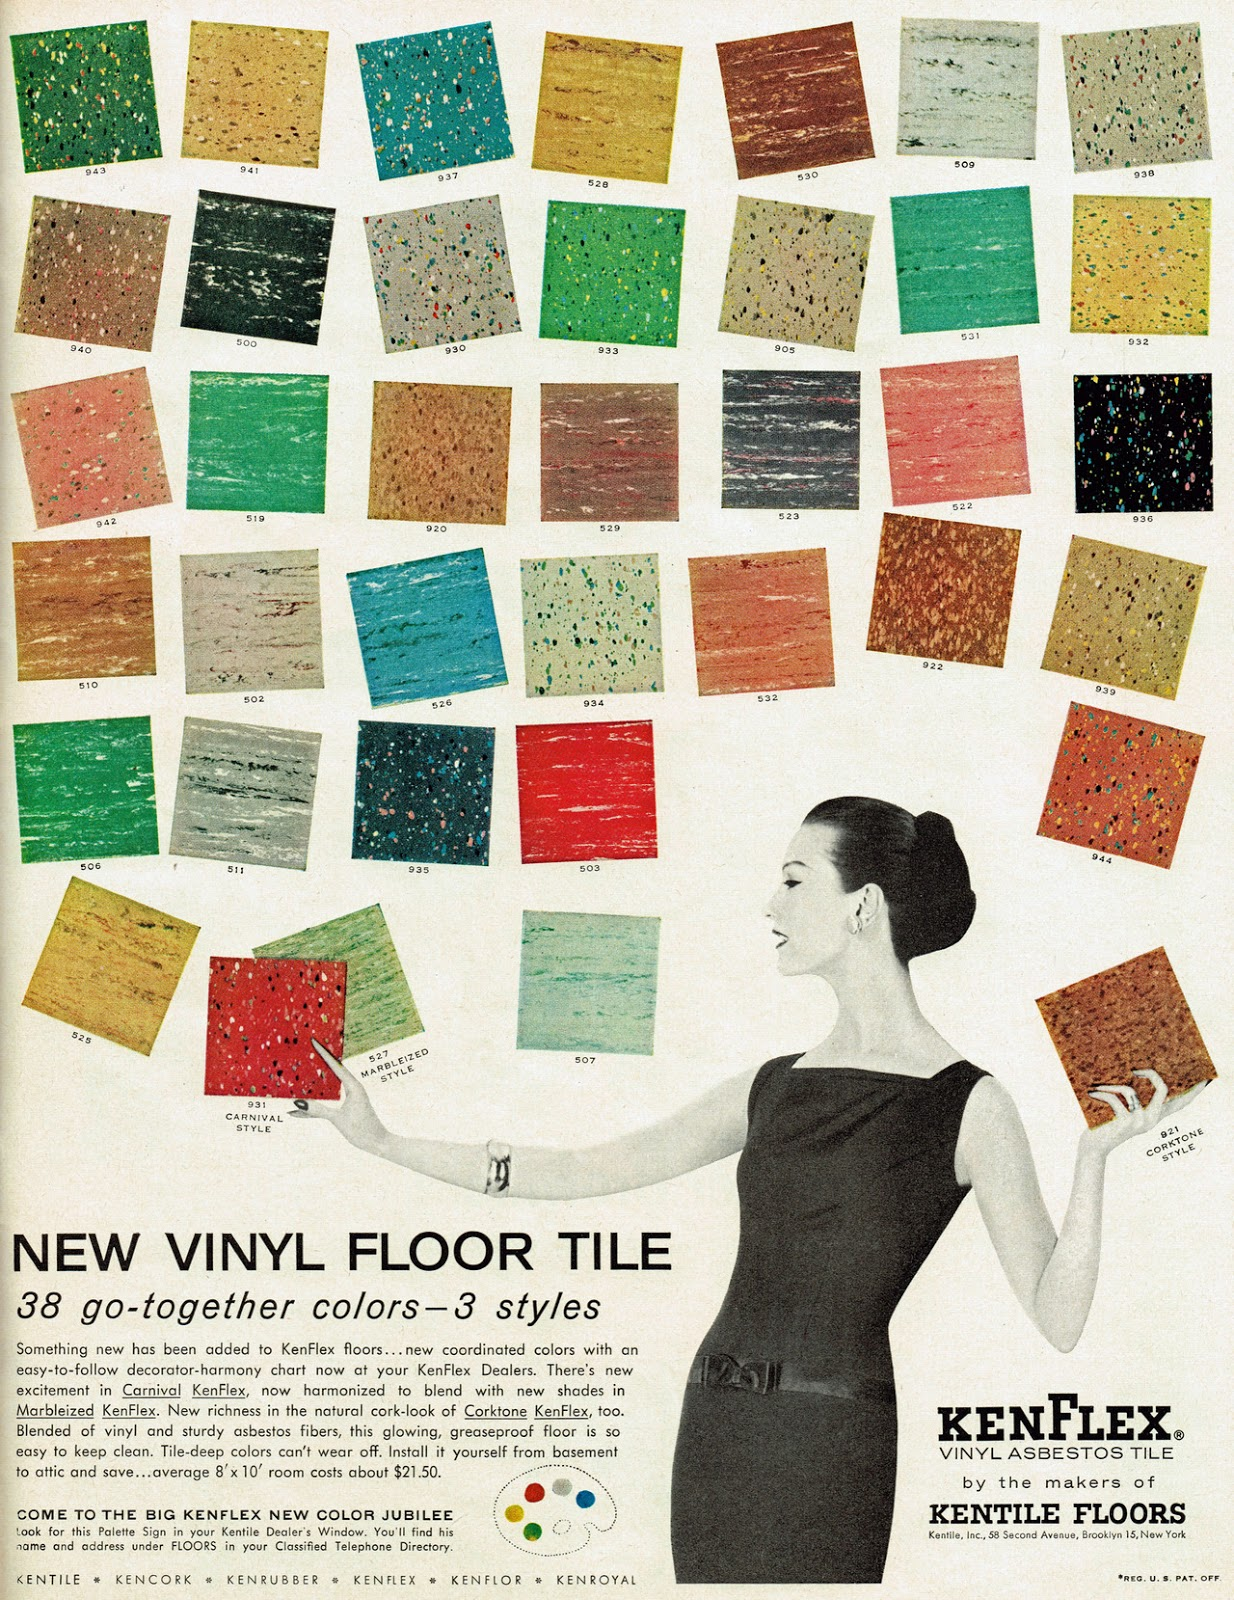 9x9 Floor Tile Asbestos Librarian Tells All December